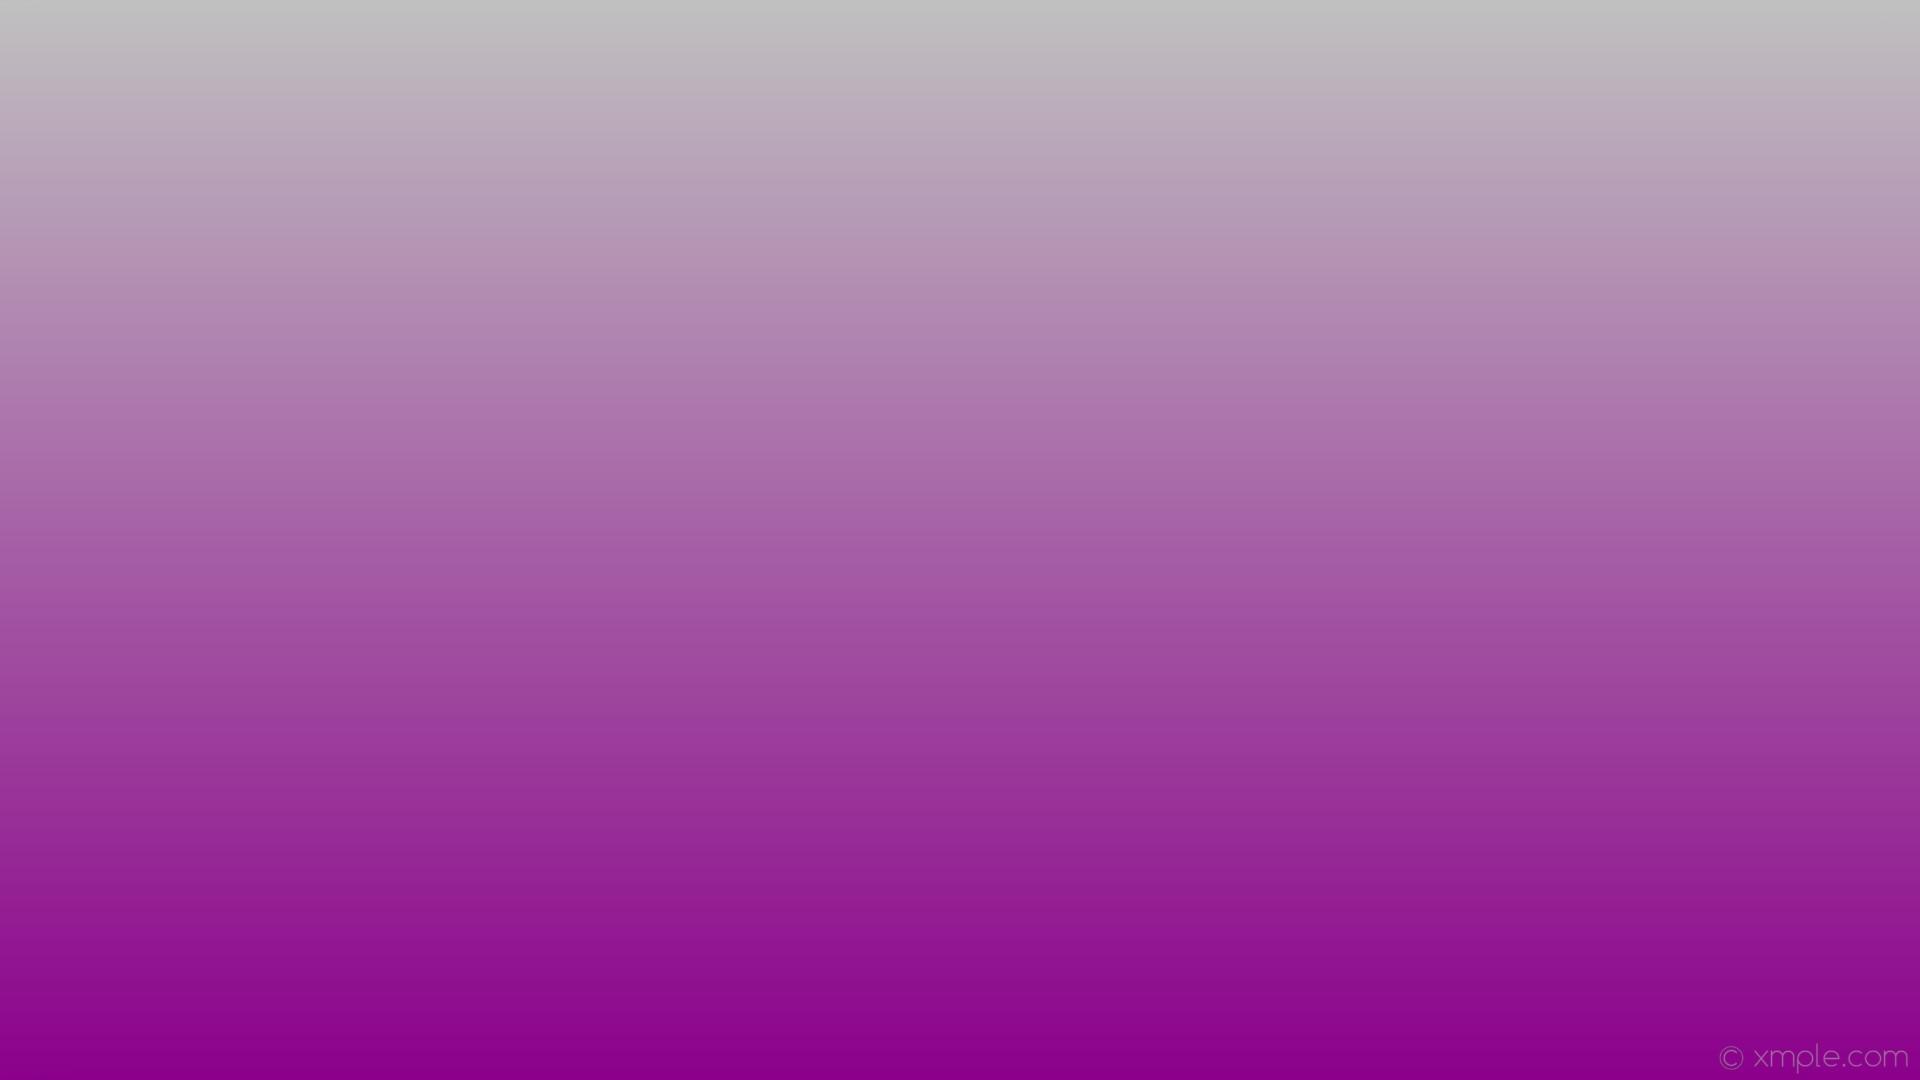 wallpaper gradient purple linear grey dark magenta silver #8b008b #c0c0c0  270°